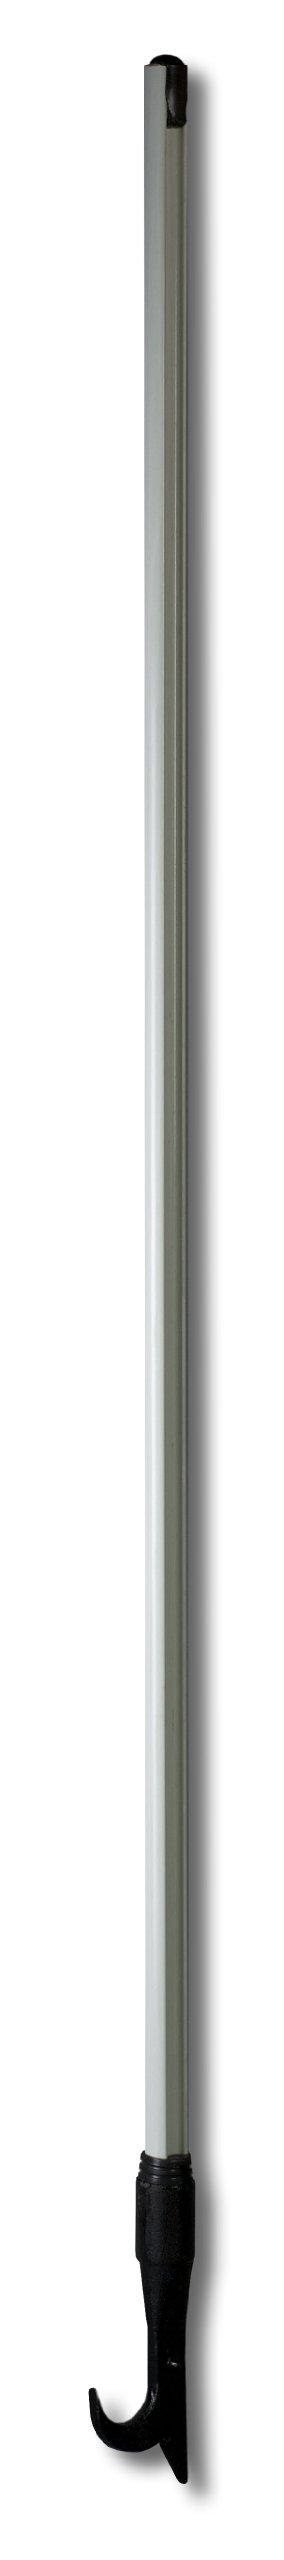 Nupla SPD-4 Super Duty I-Beam Pike Pole with Butt Grip, 4' Length